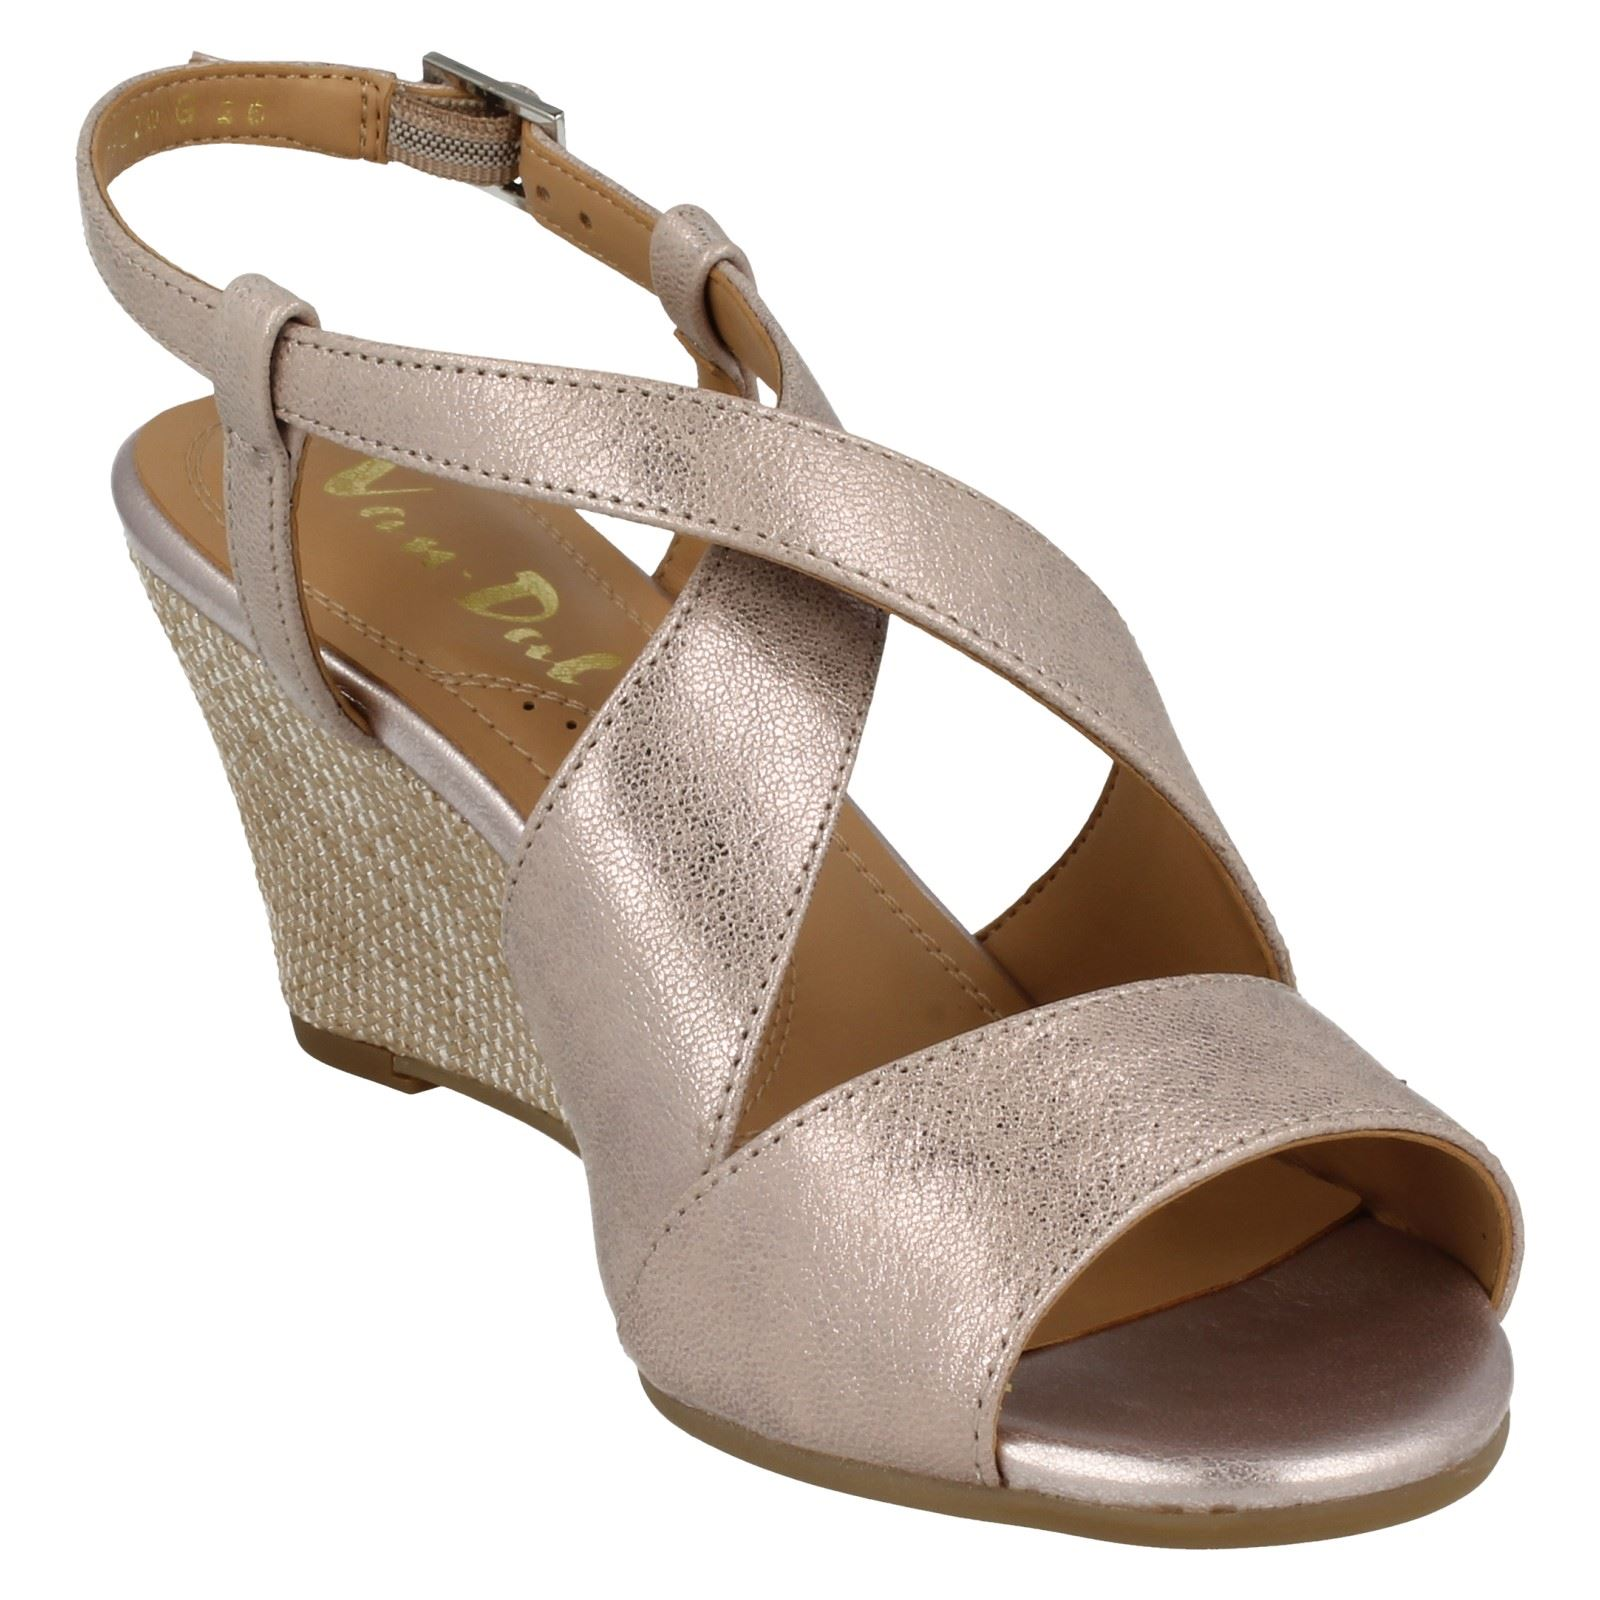 Ladies-Van-Dal-Cross-Strap-Wedged-Sandal-Allora thumbnail 7